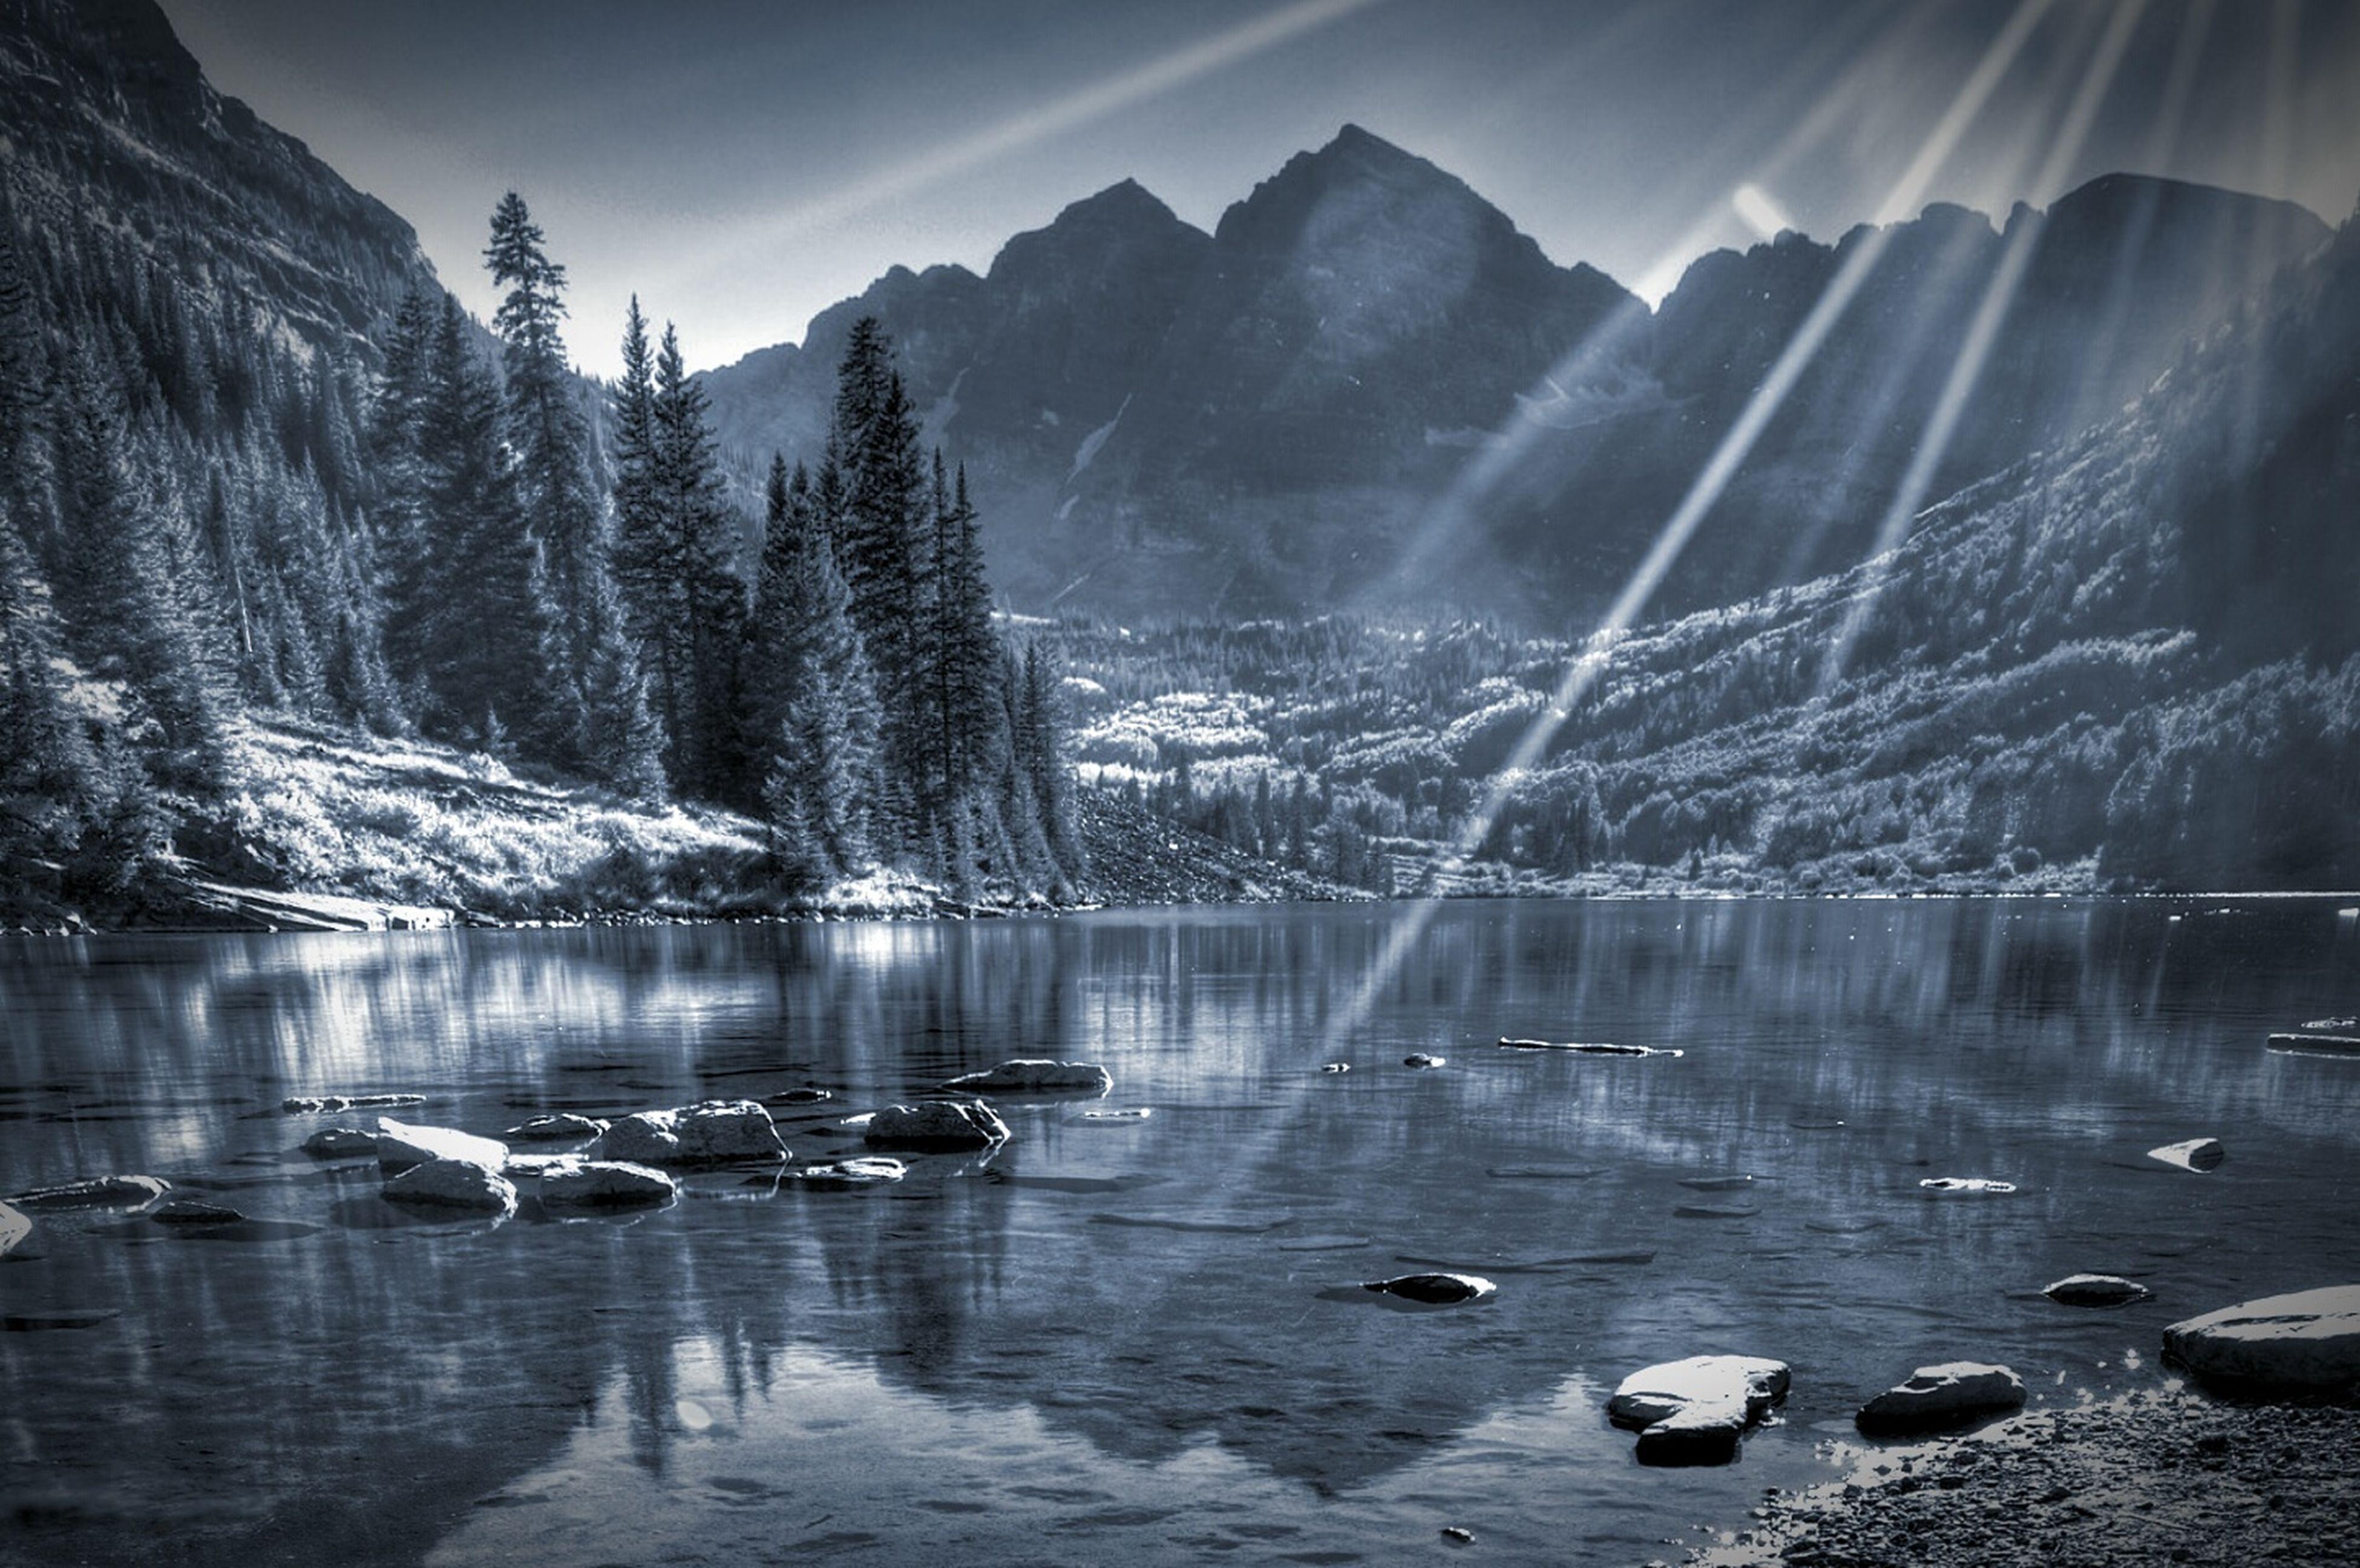 water, mountain, reflection, lake, tranquil scene, scenics, tranquility, beauty in nature, nature, mountain range, sky, sun, sunlight, river, idyllic, tree, rock - object, waterfront, sunbeam, outdoors